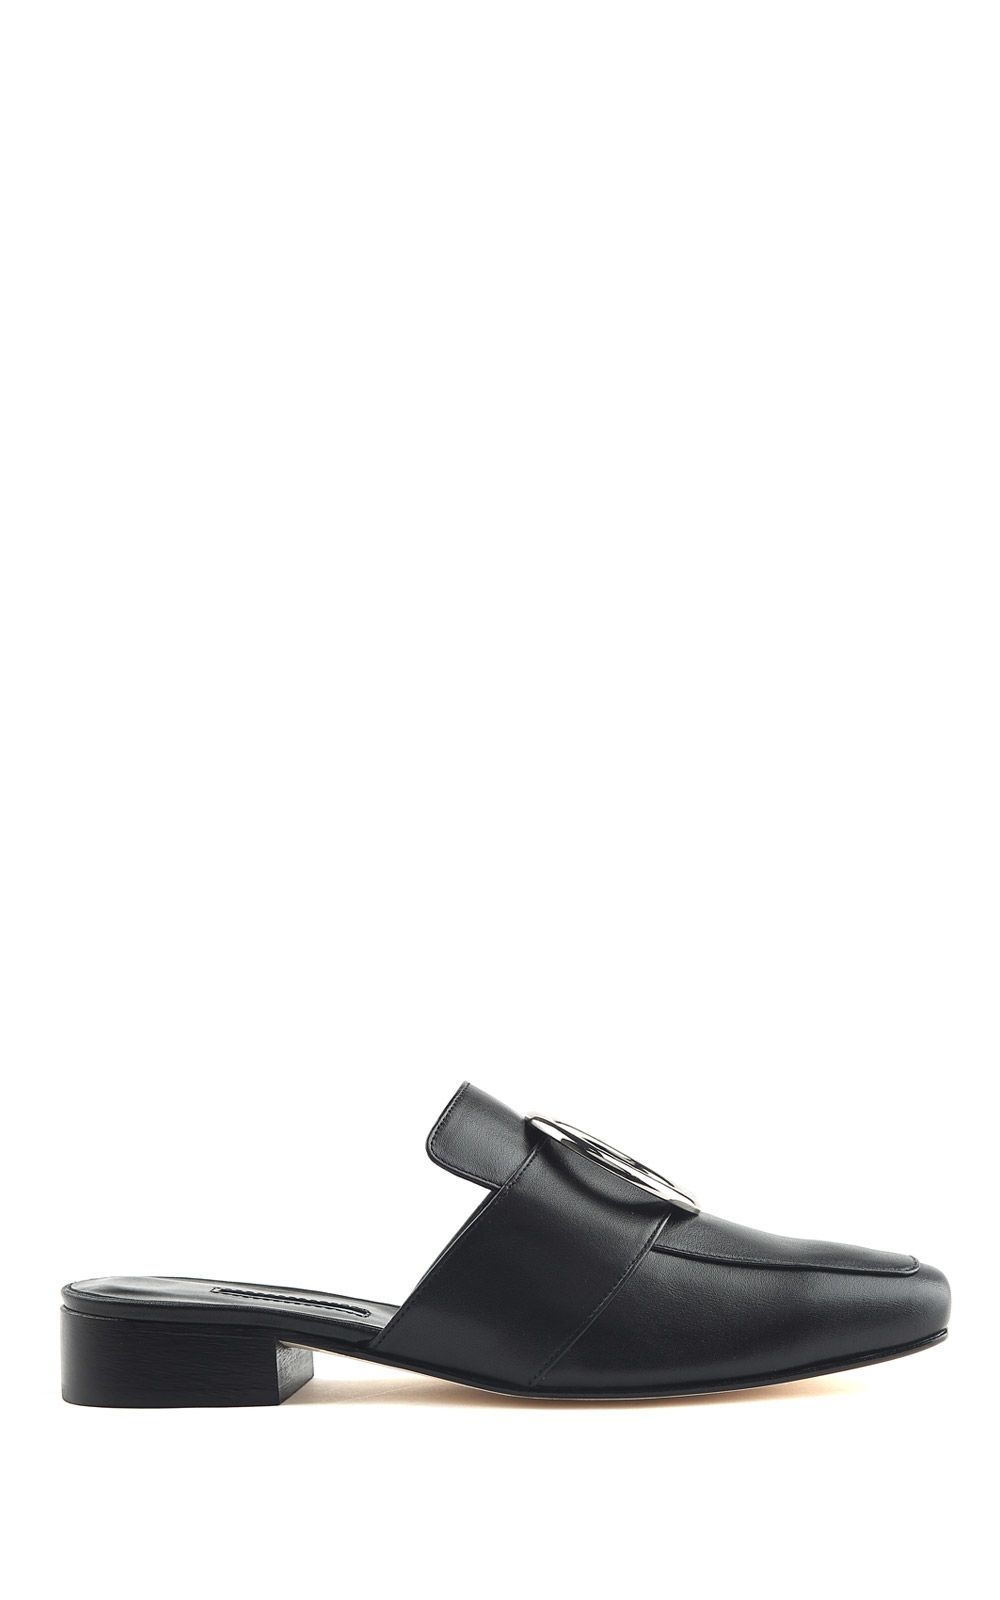 DORATEYMUR Leather Flats 7tU0tKX